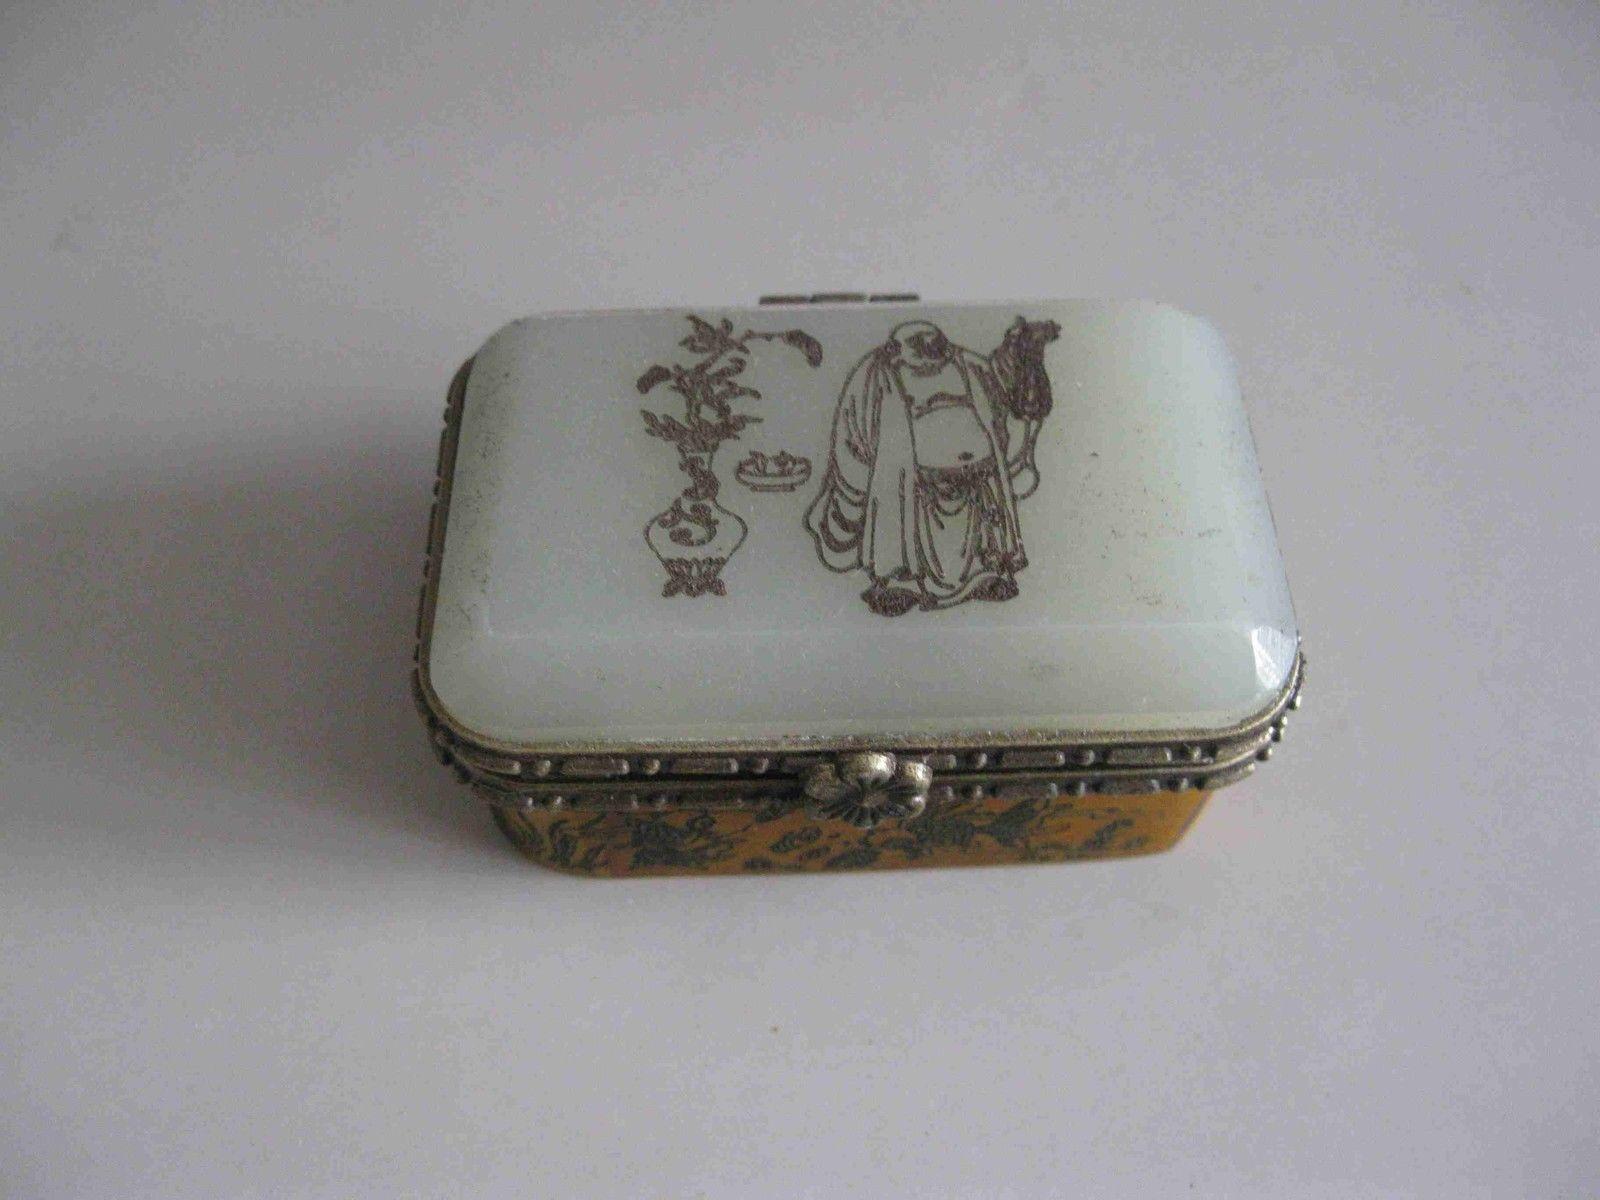 China Vintage Collectible Handwork Bone Inlay Jade Carving Horse Fish Jewel Box